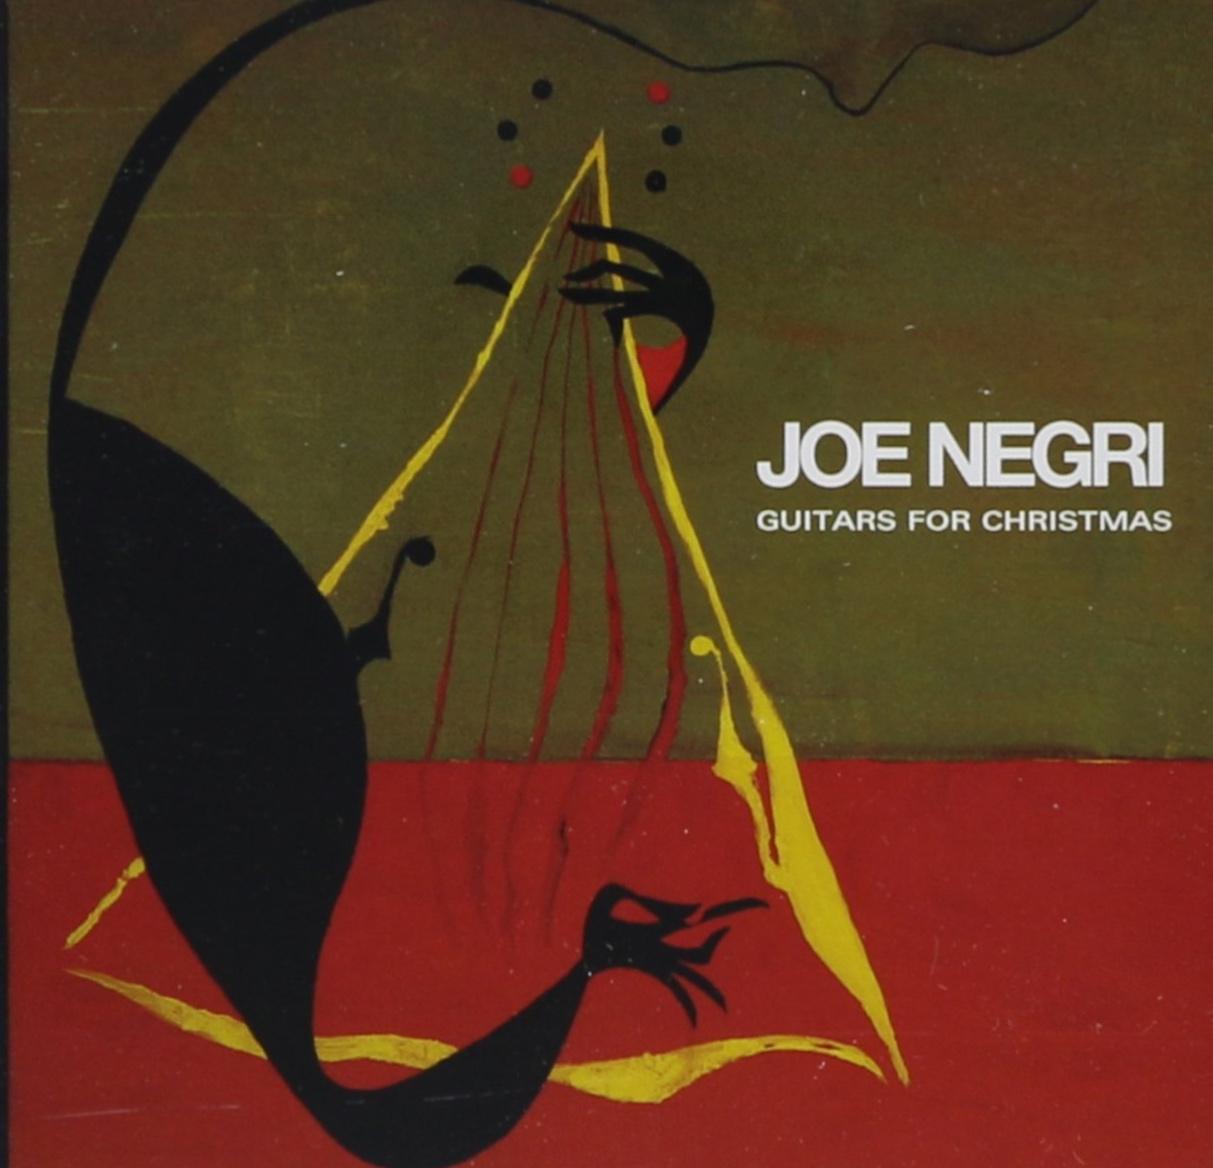 Joe+Negri+Guitars+Christmas.jpg